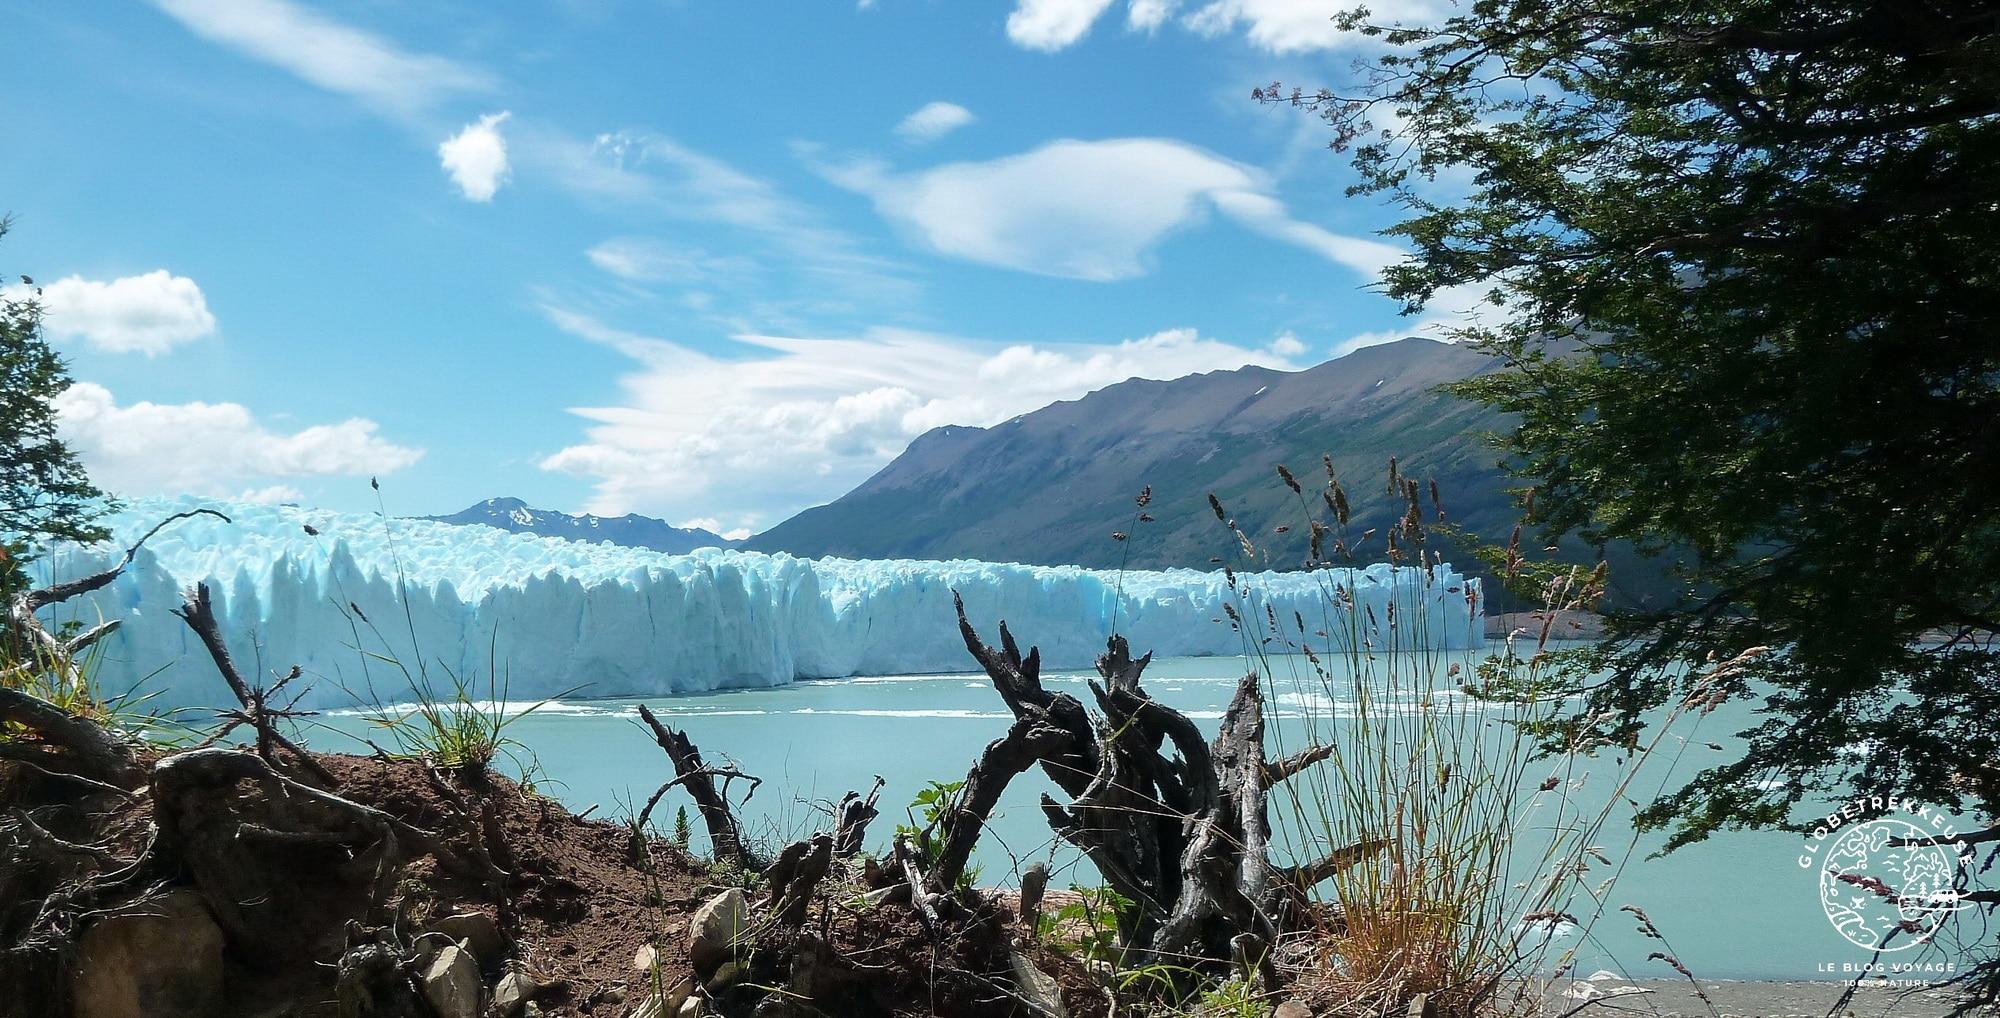 visiter la patagonie perito moreno globetrekkeuse